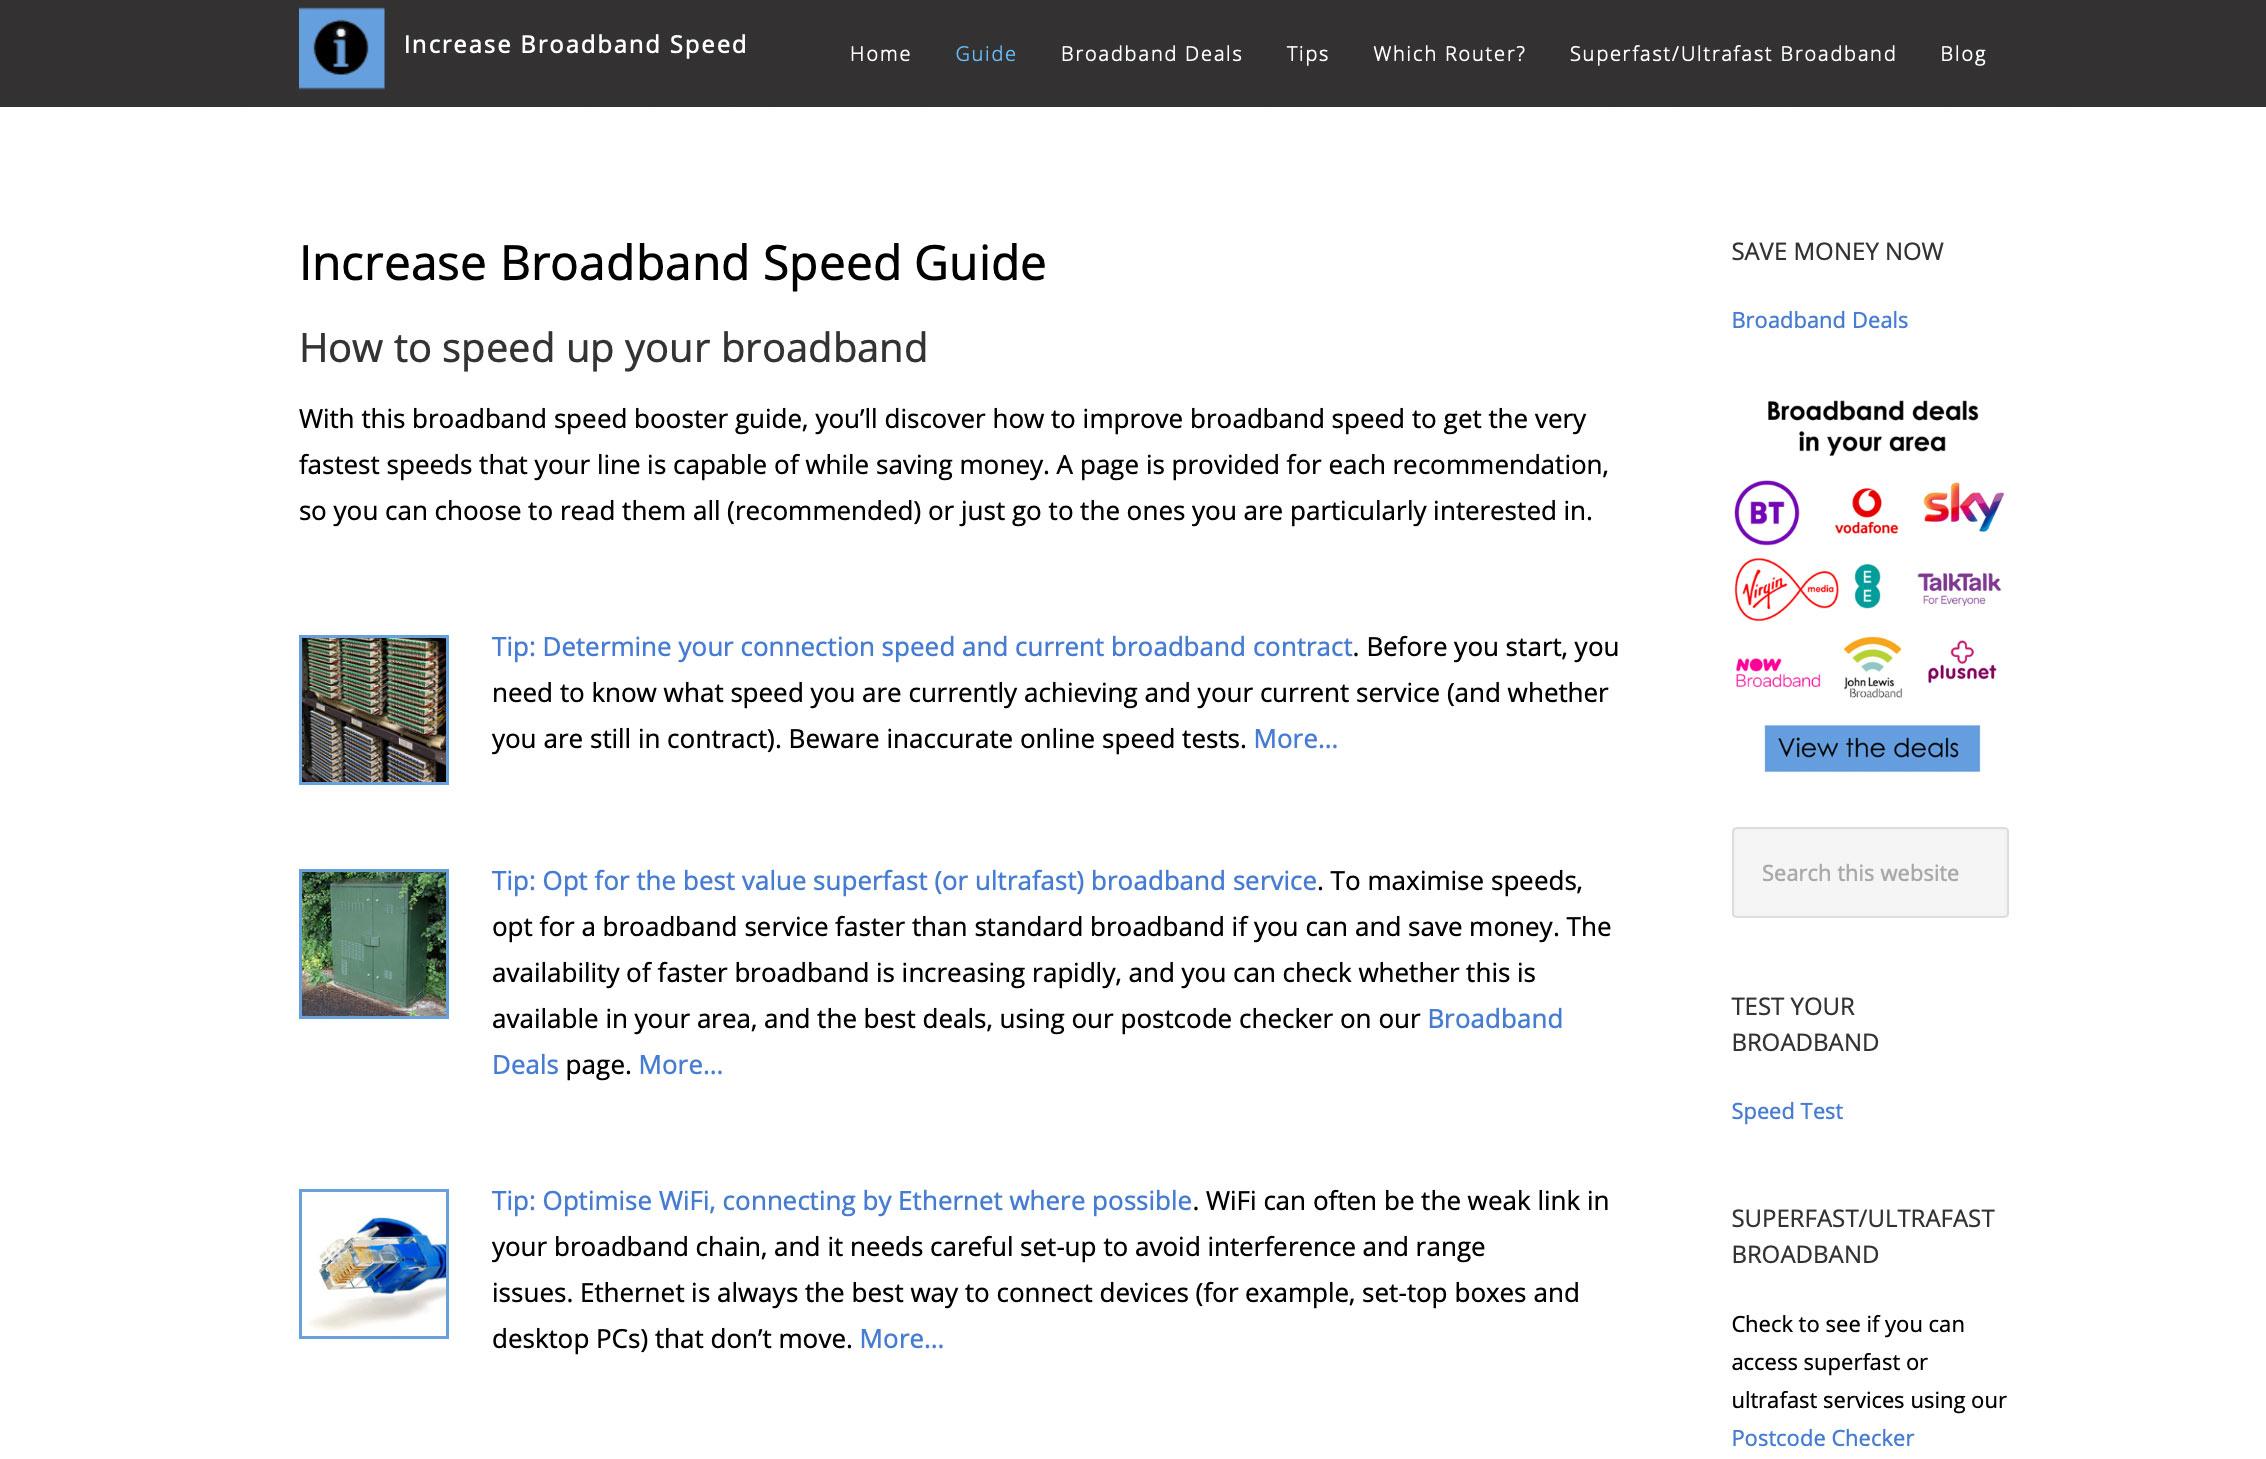 Increase Broadband Speed webpage